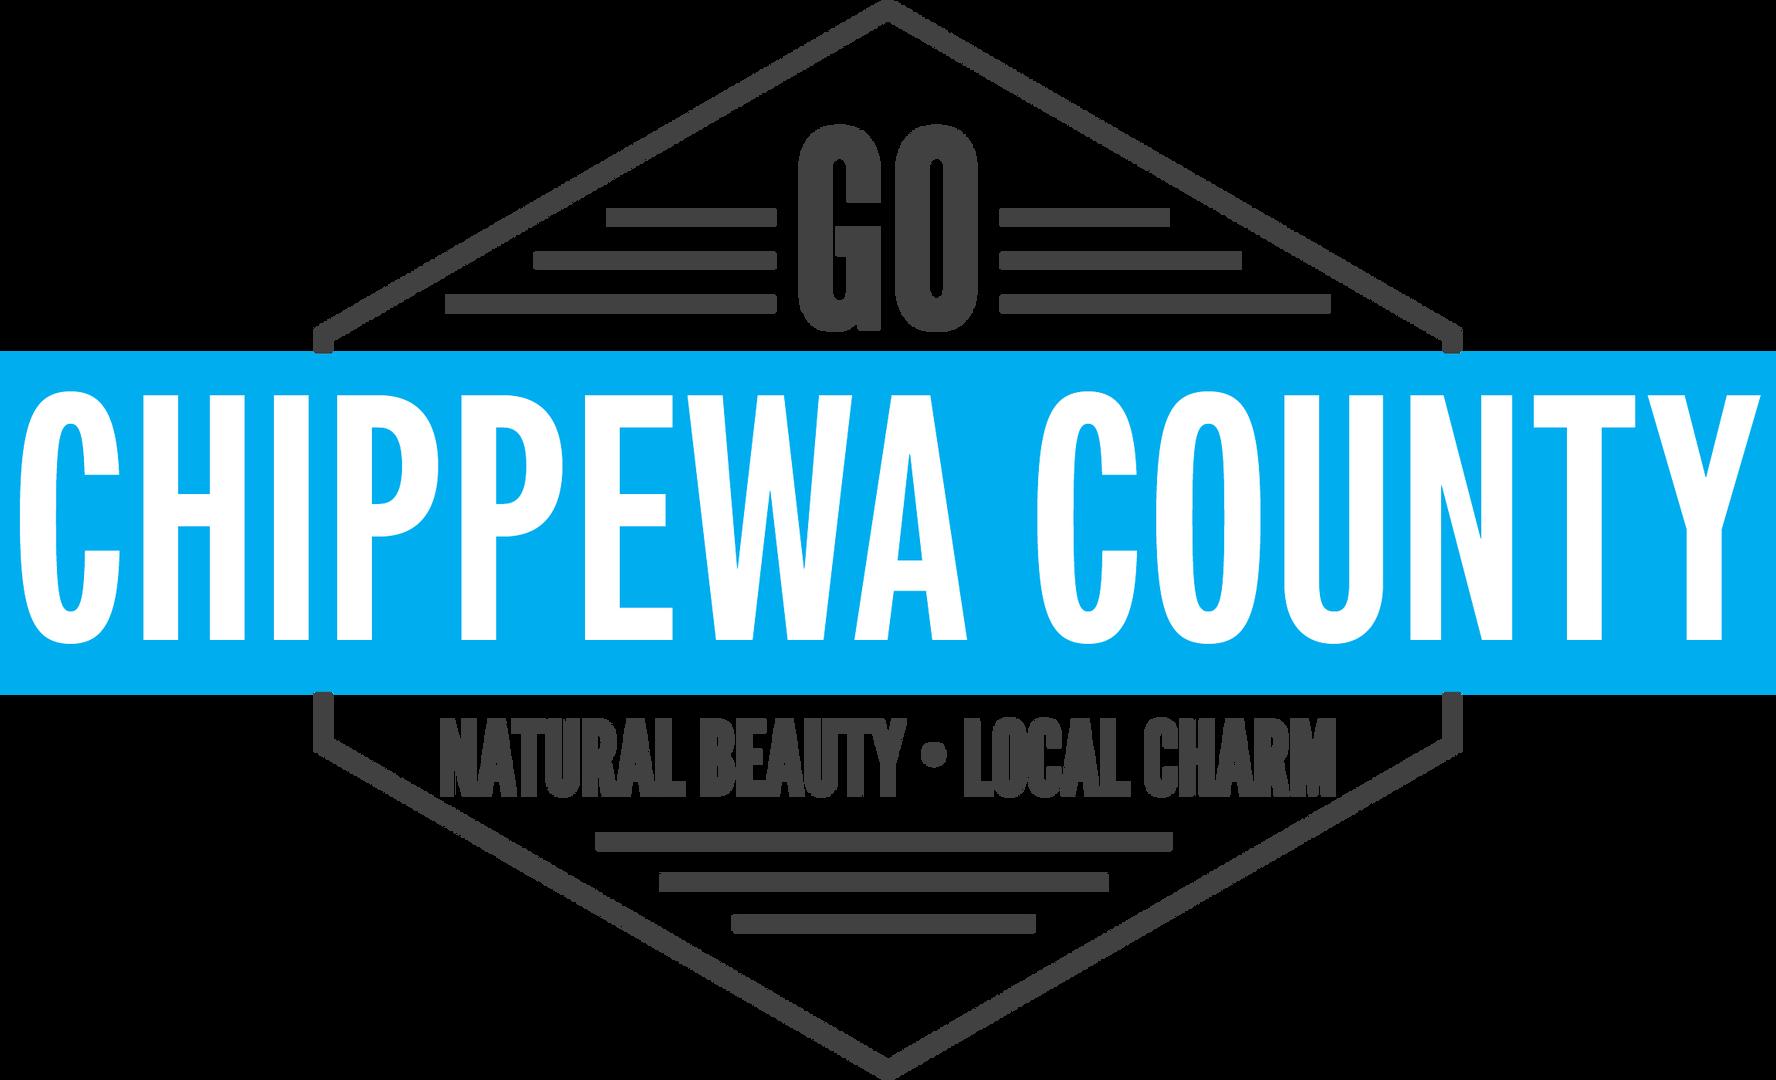 GoChippewaCounty_Logo correct blue 10.19